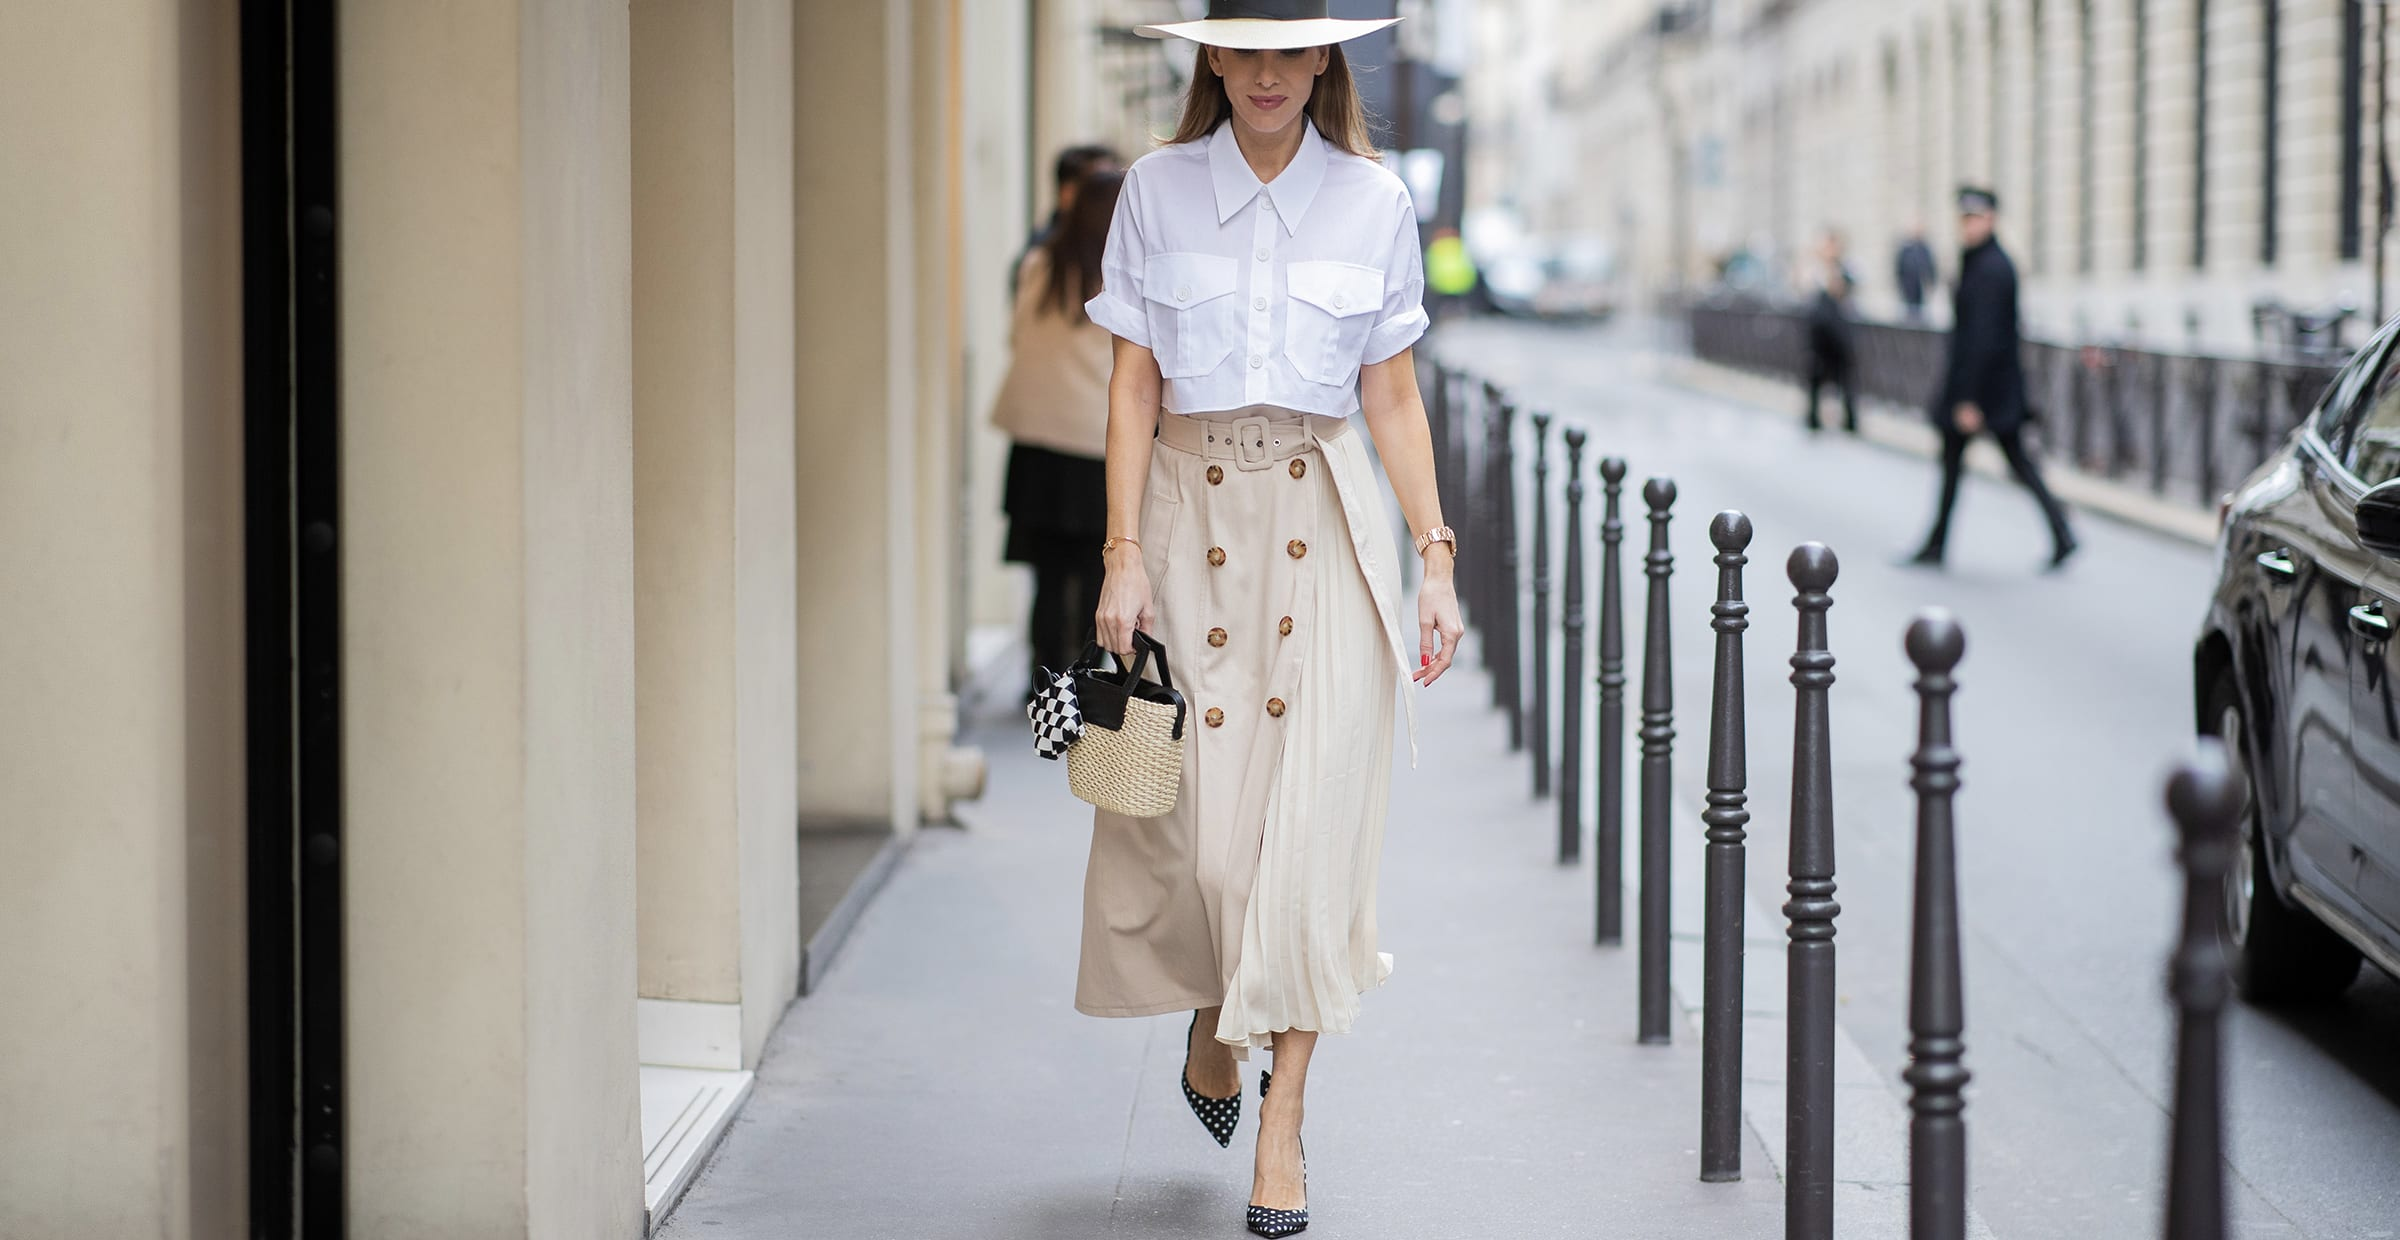 Women in a long skirt